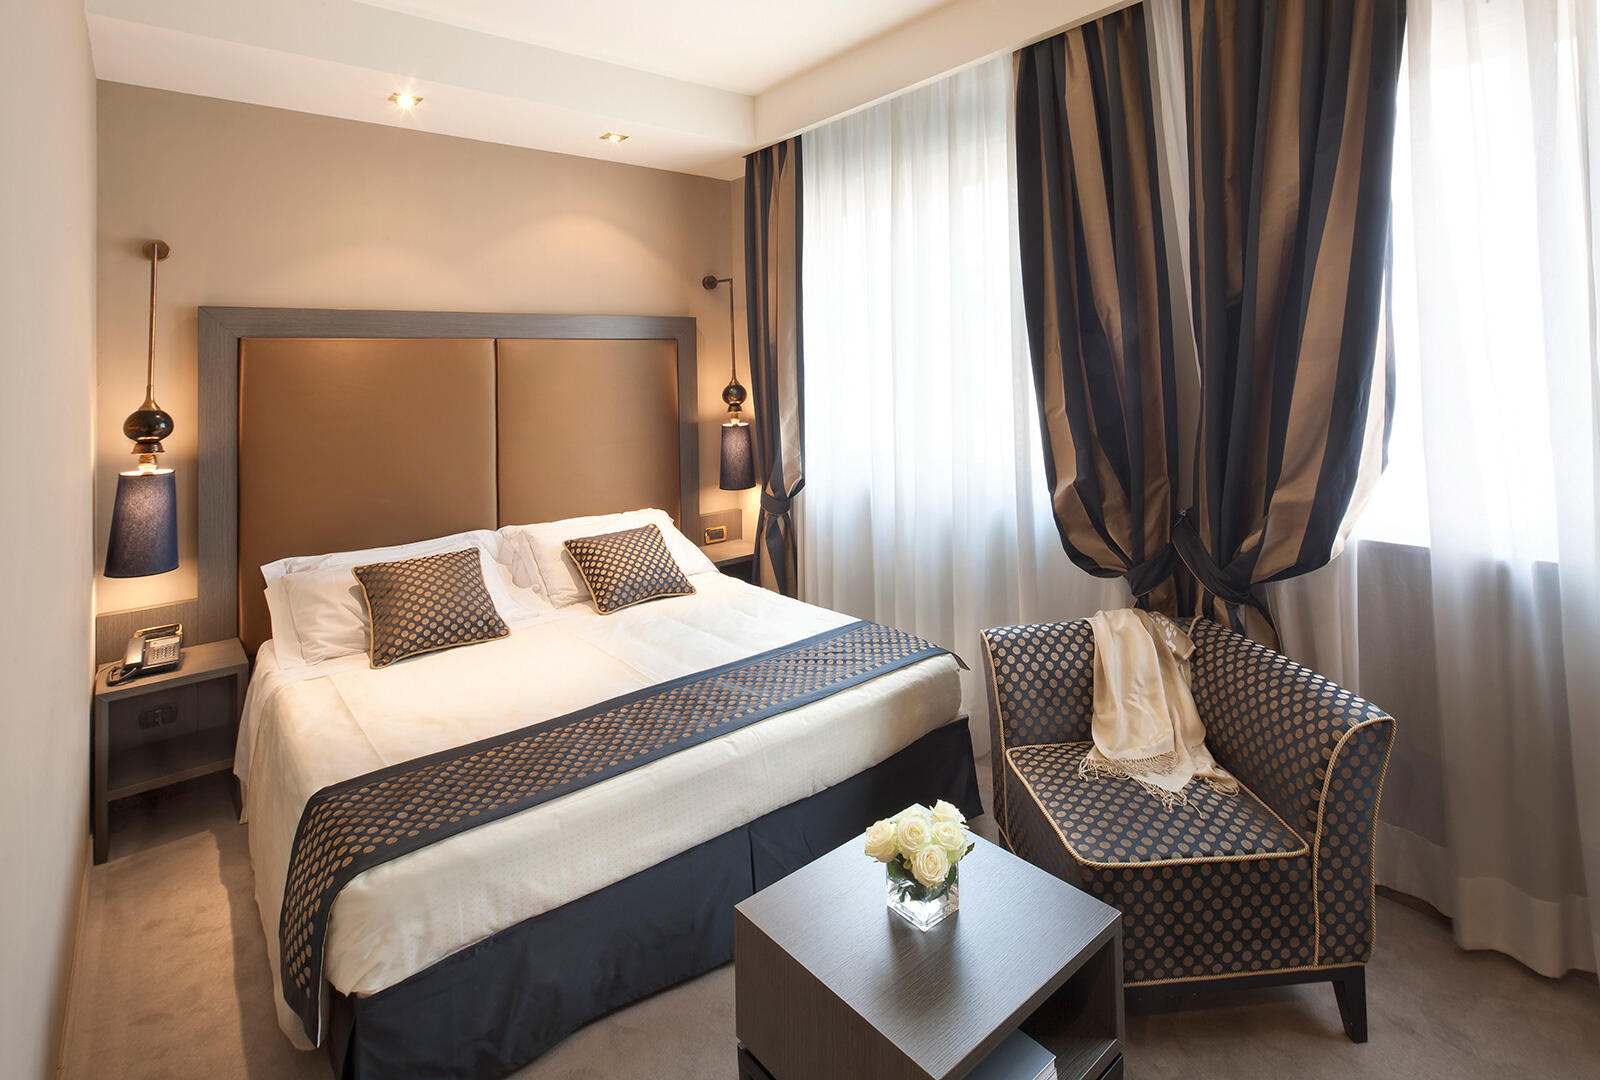 Superior Room at Hotel Mozart in Milan